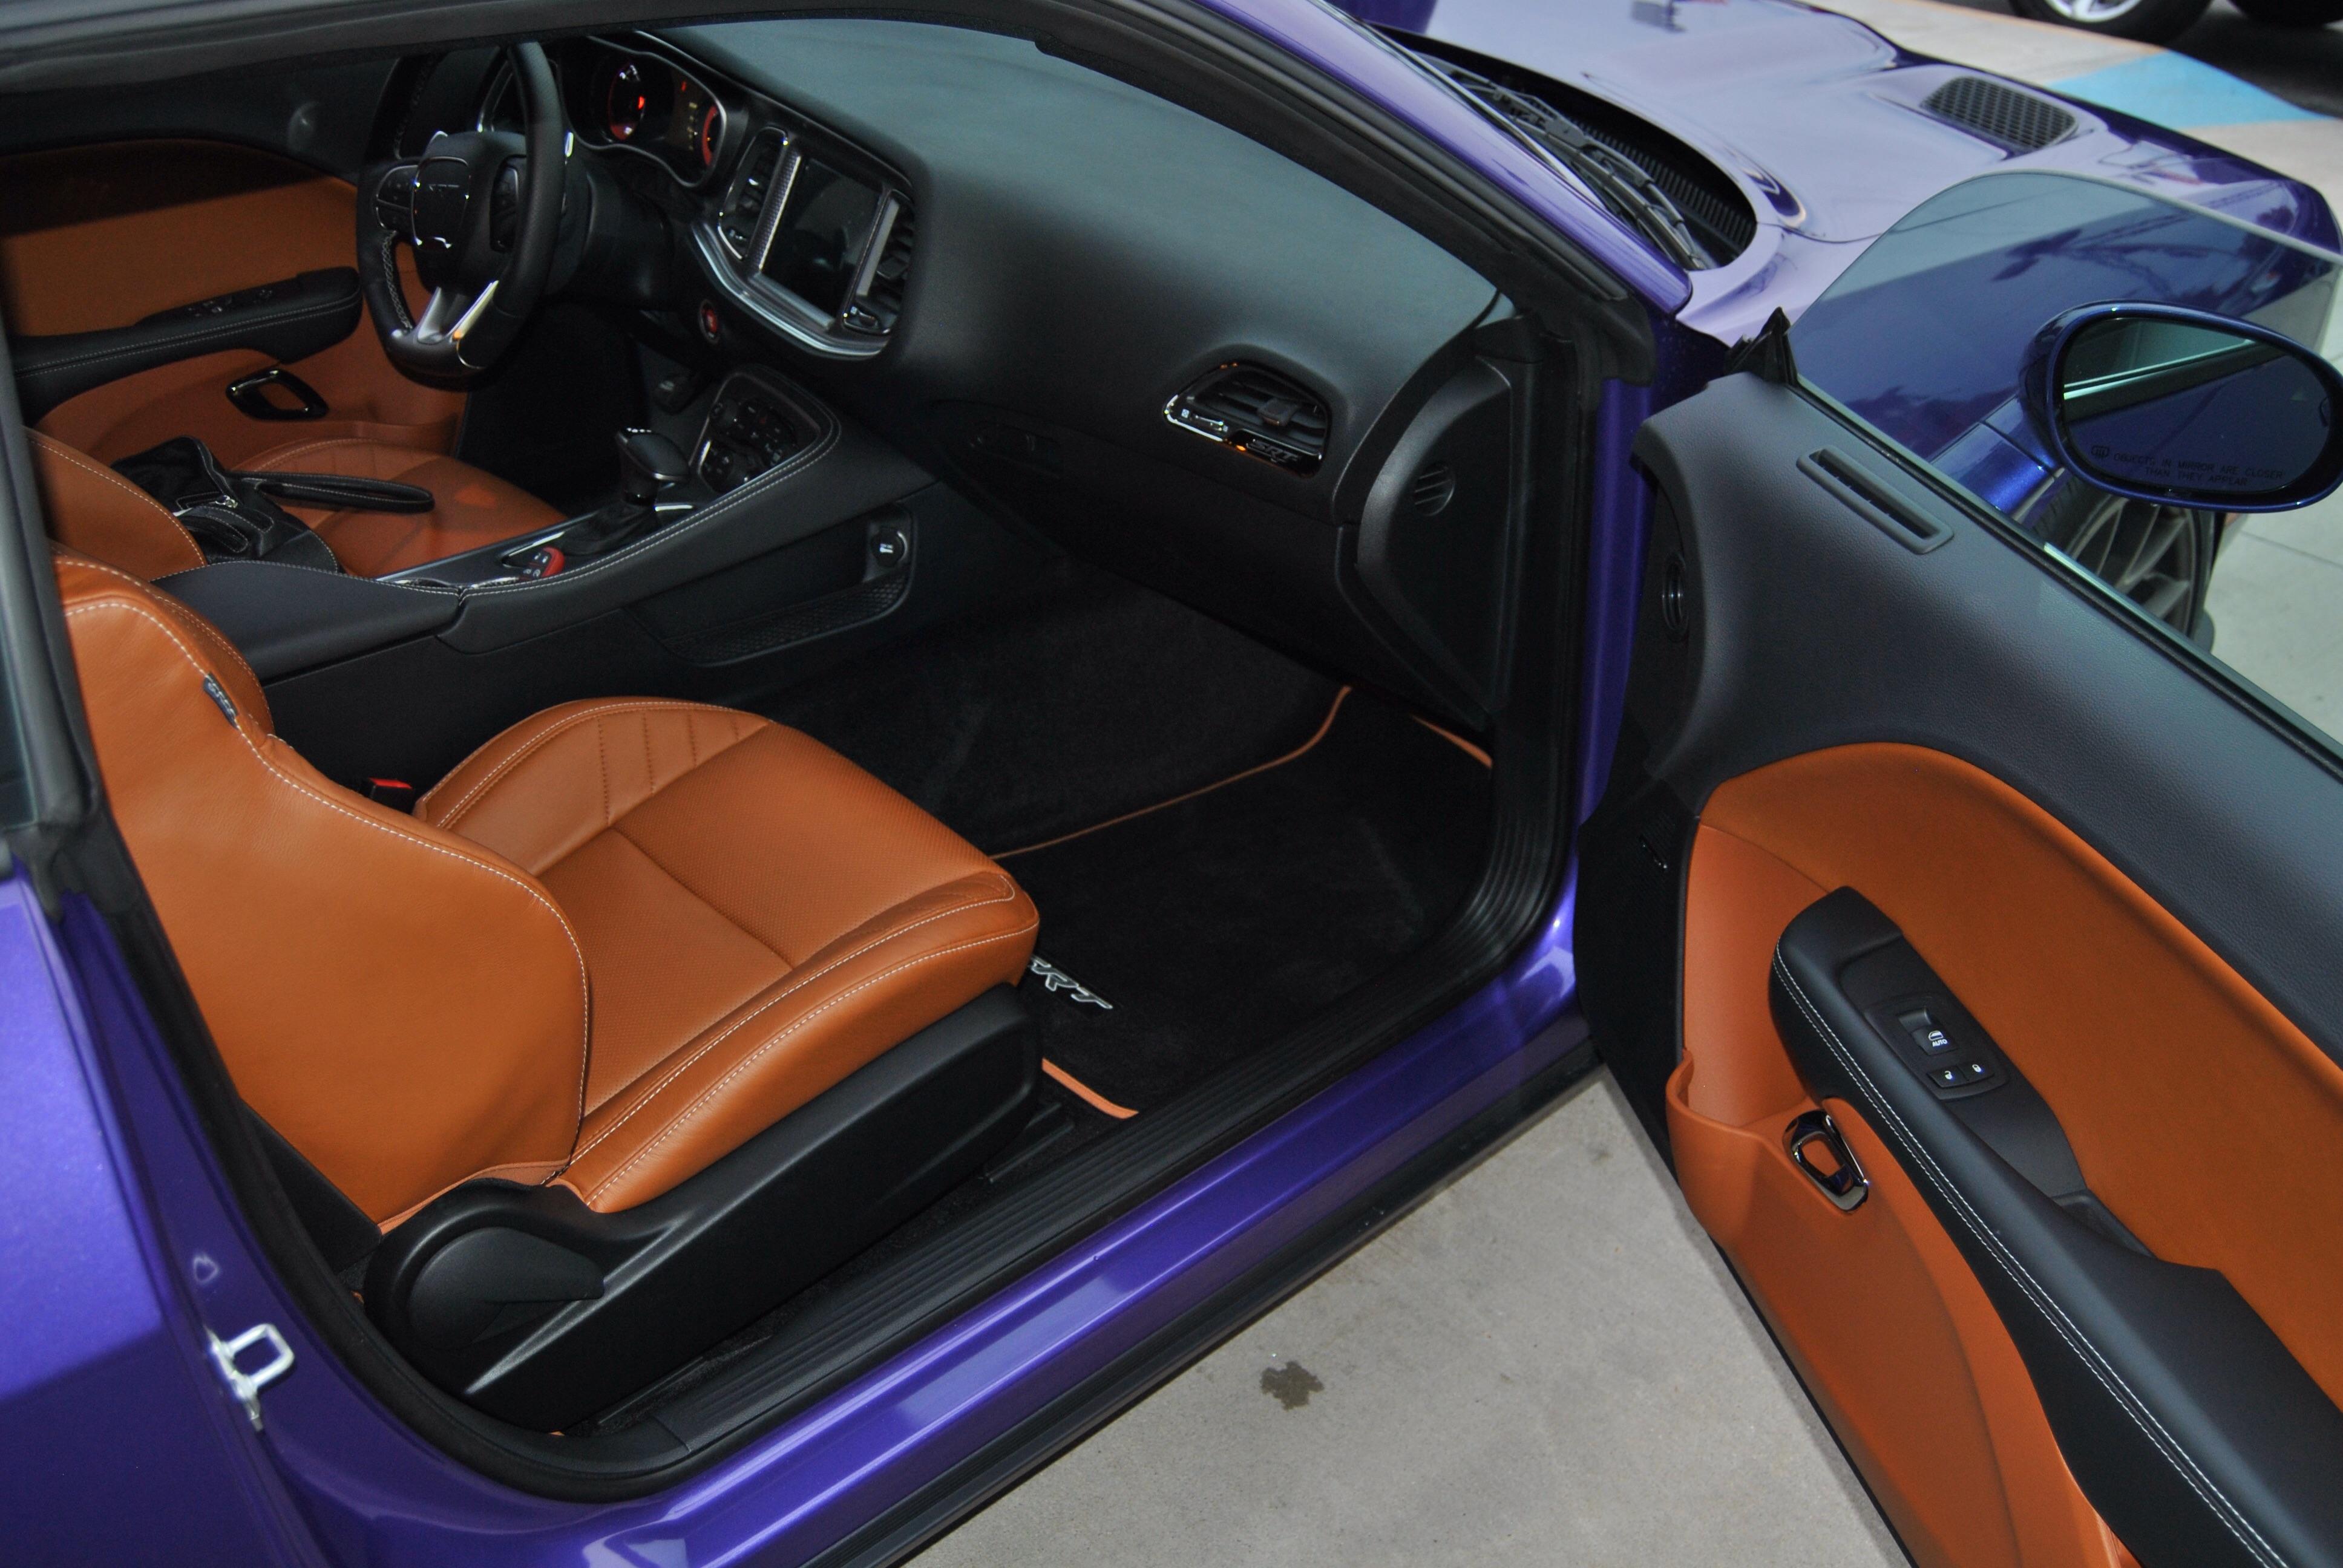 2018 Dodge Charger >> Plum Crazy Purple Hellcat Photos | SRT Hellcat Forum